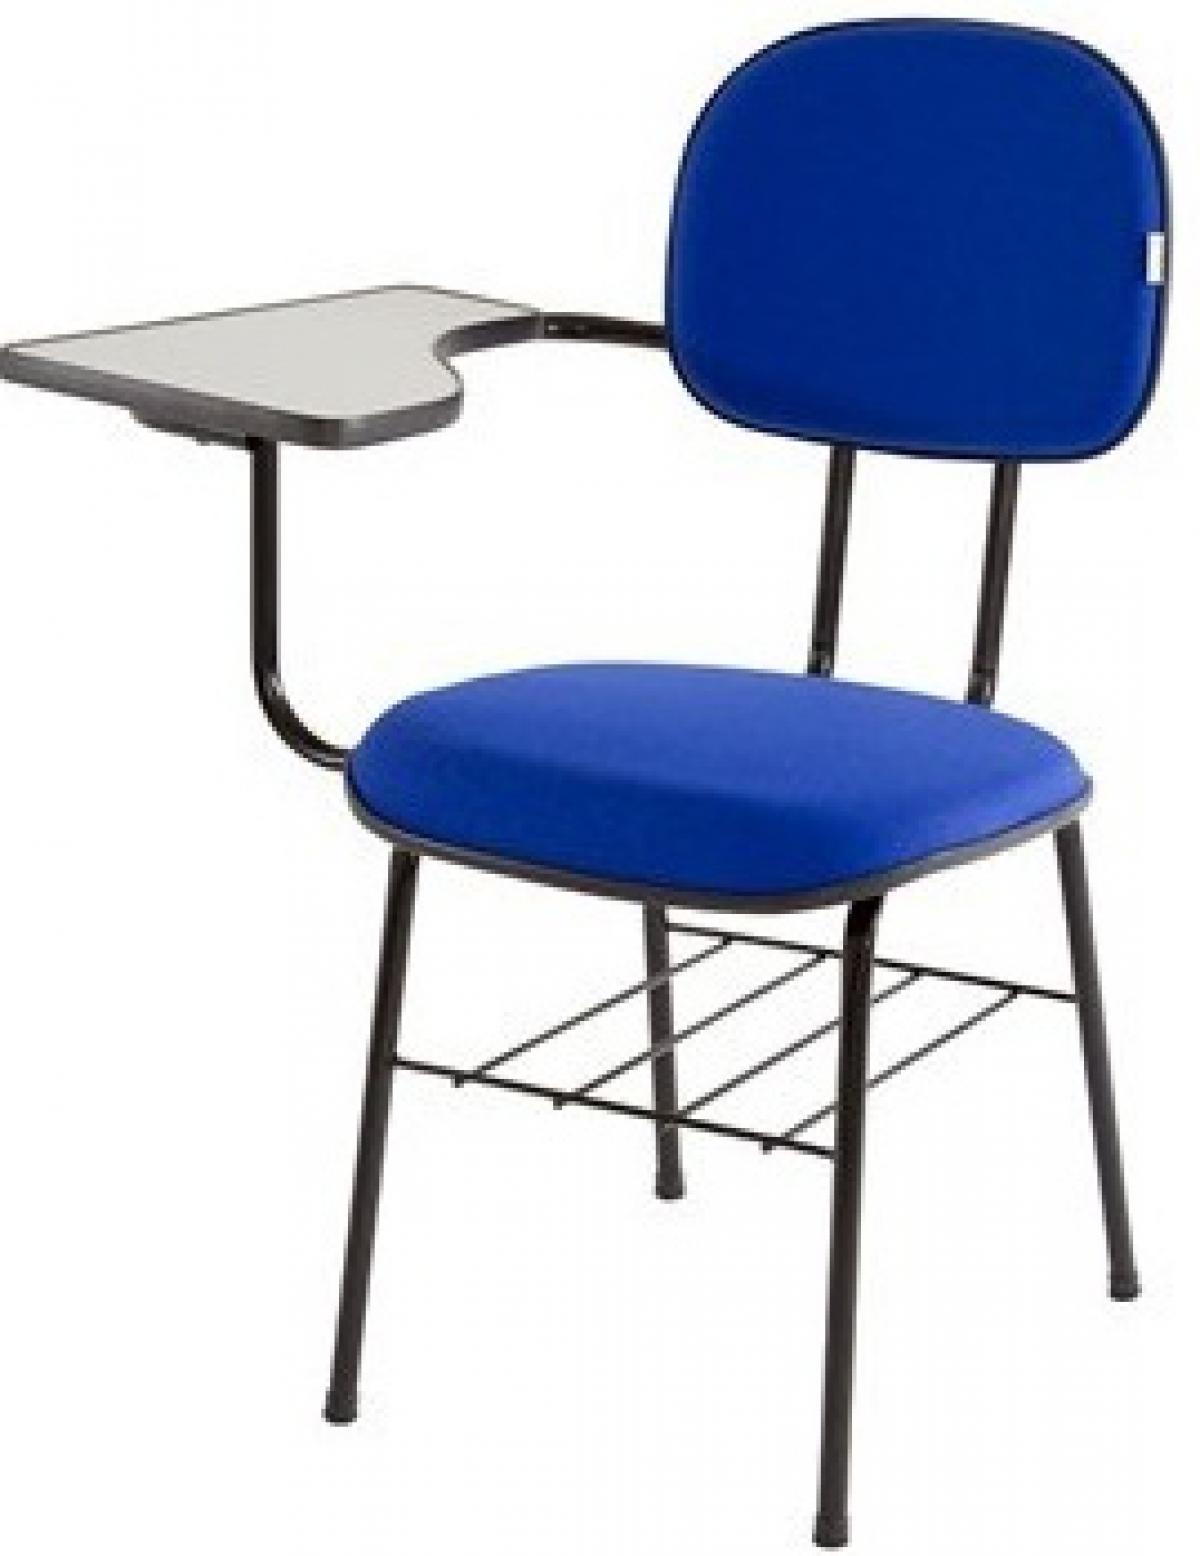 CAD - 51 Cadeira Univérsitaria Escolar Estofada Varias Cores